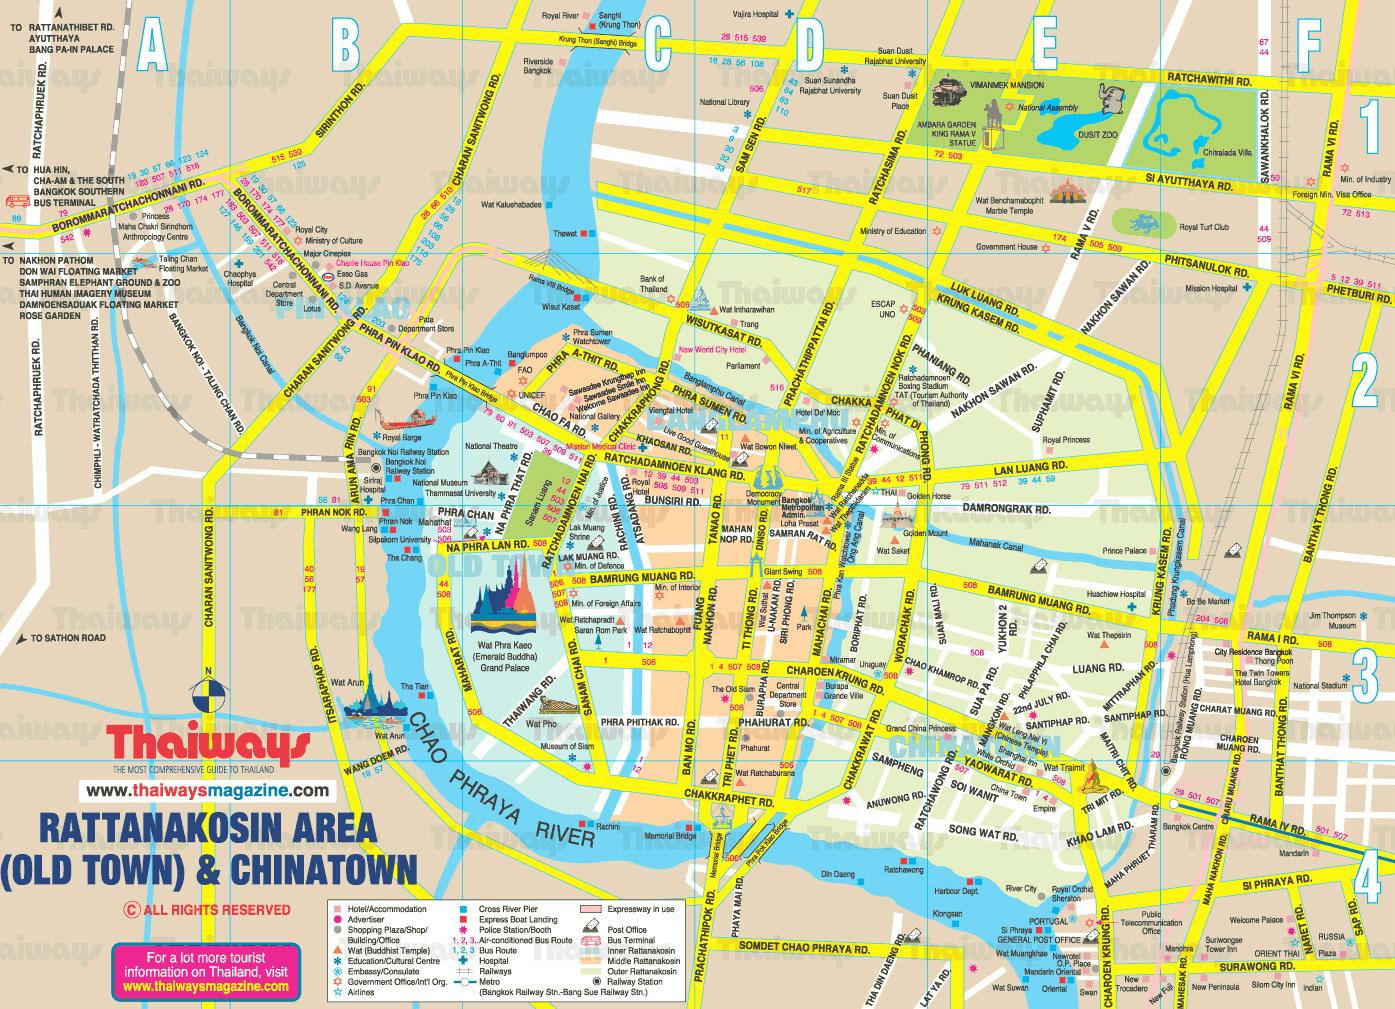 Rattanakosin Area Bangkok Thailand Map - Bangkok Thailand • mappery